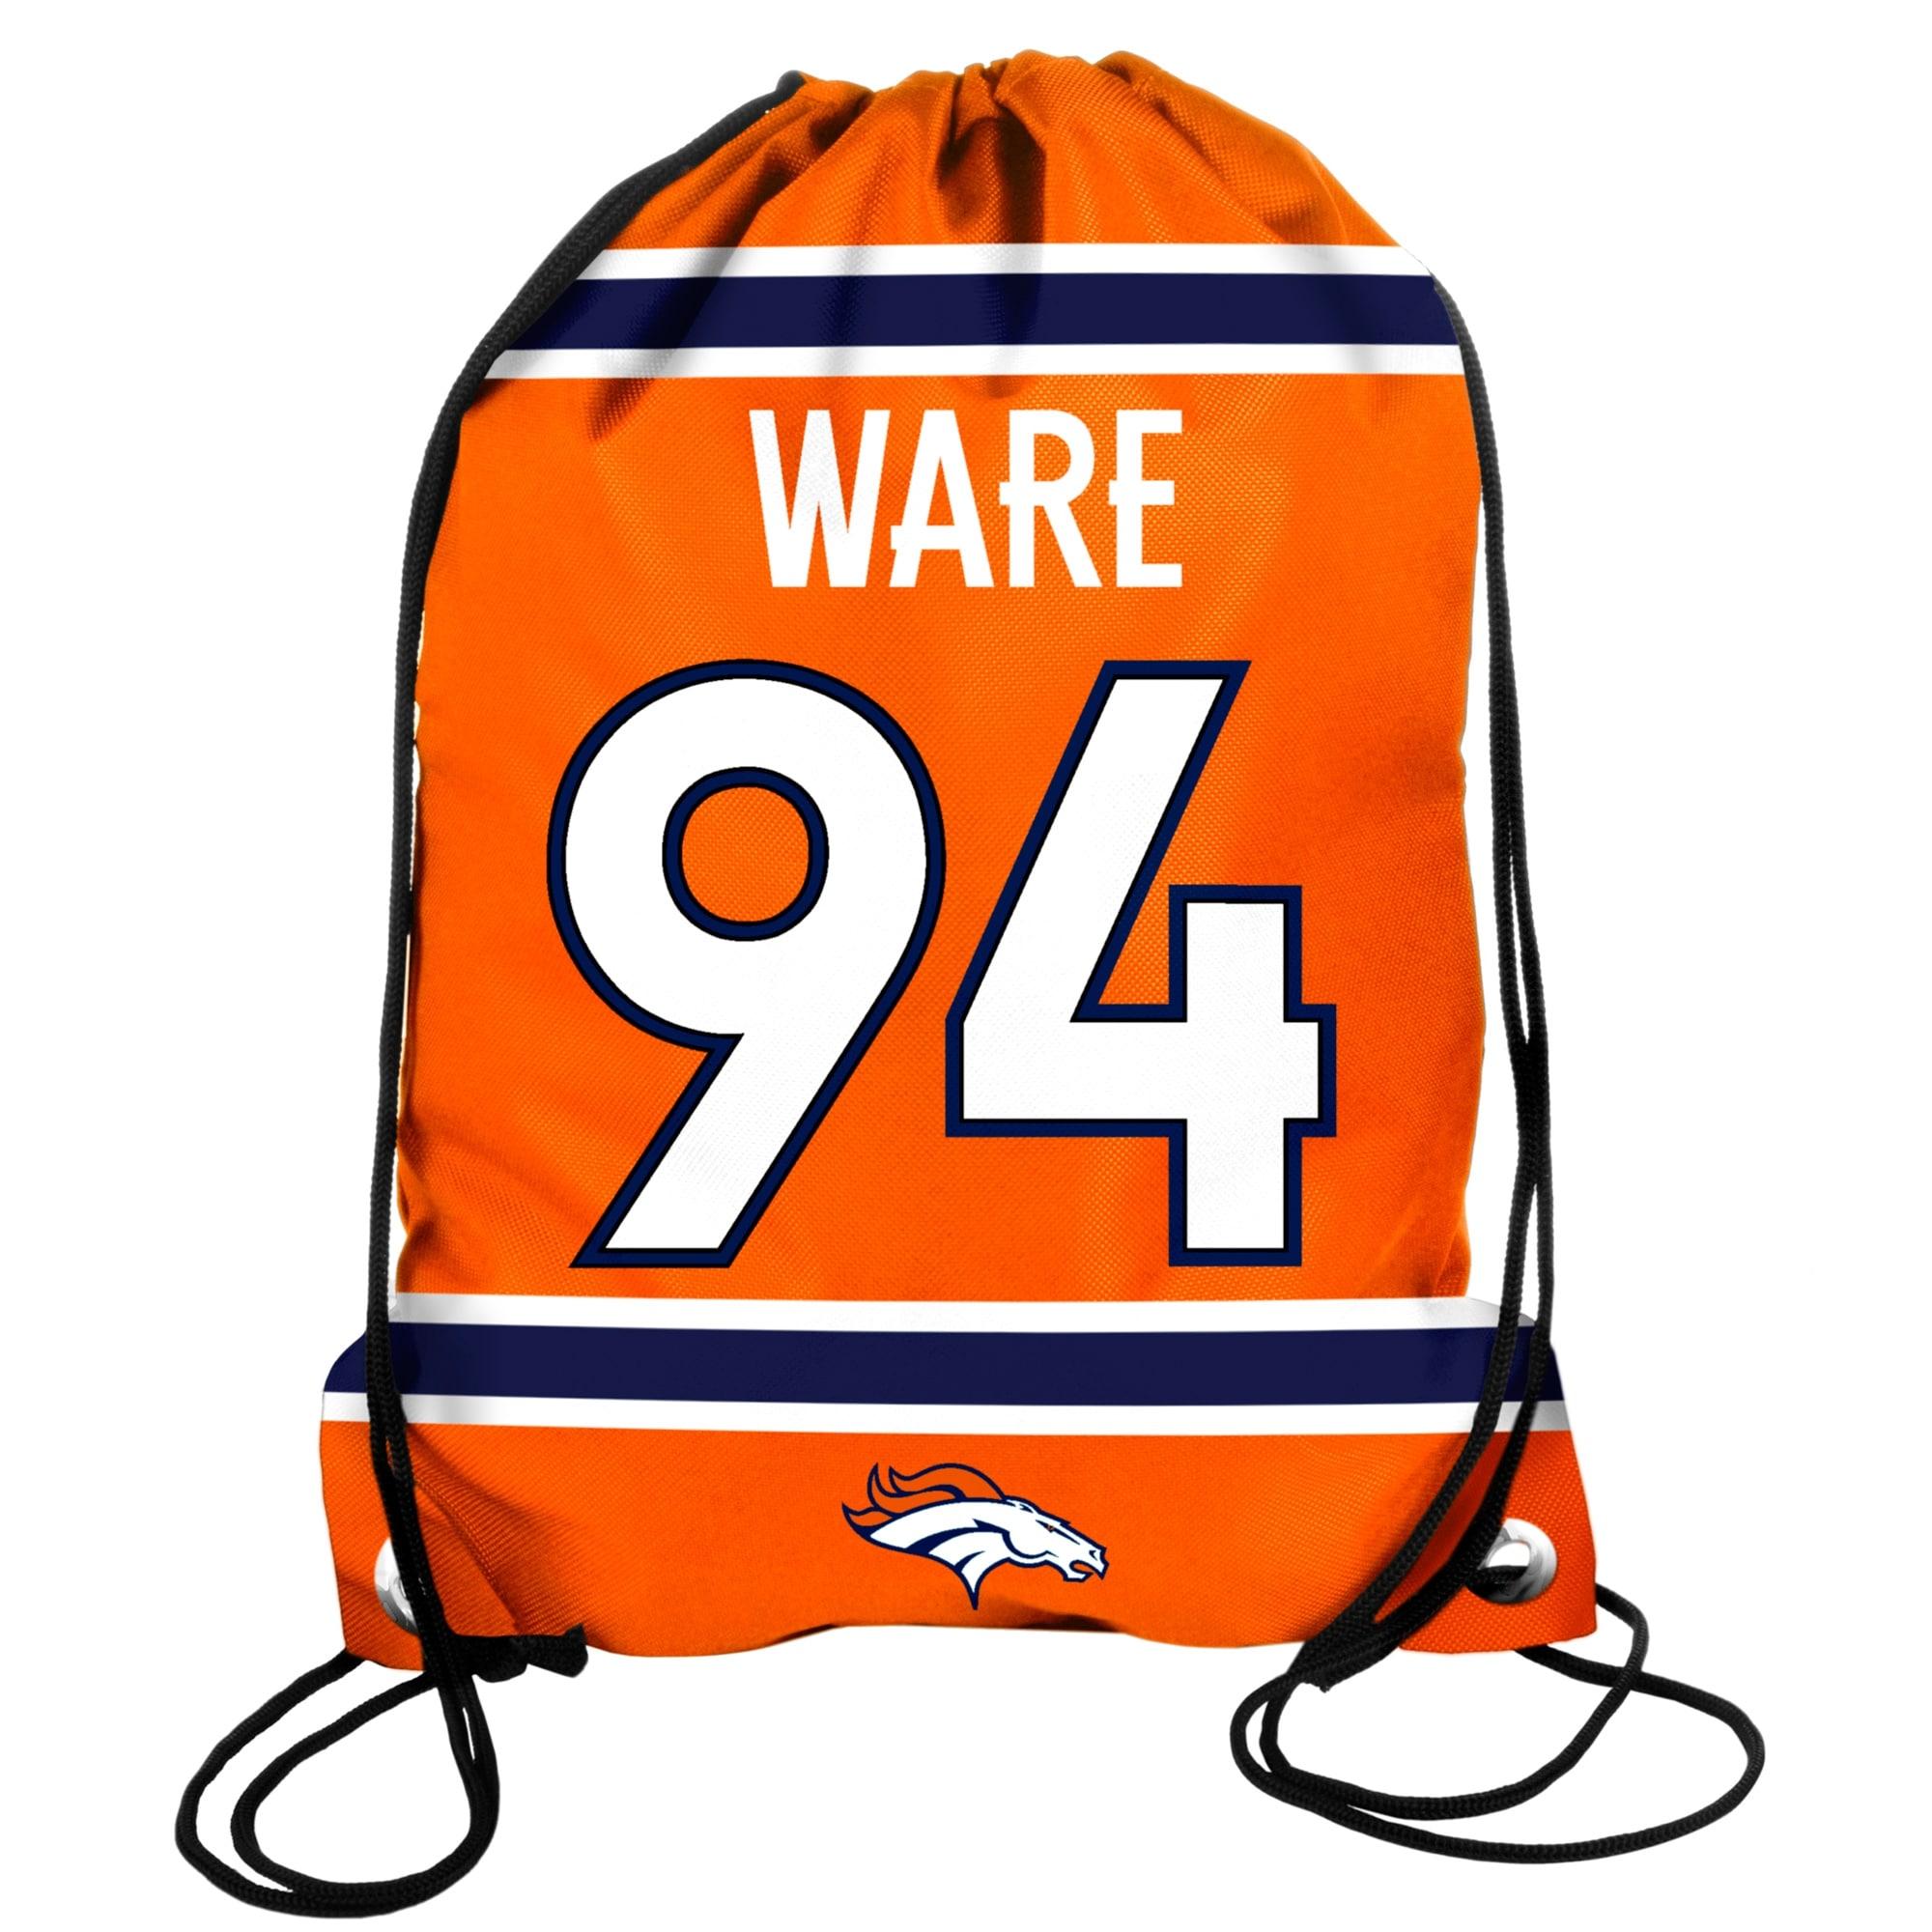 No. 94 DeMarcus Ware Denver Broncos Player Drawstring Backpack - Orange